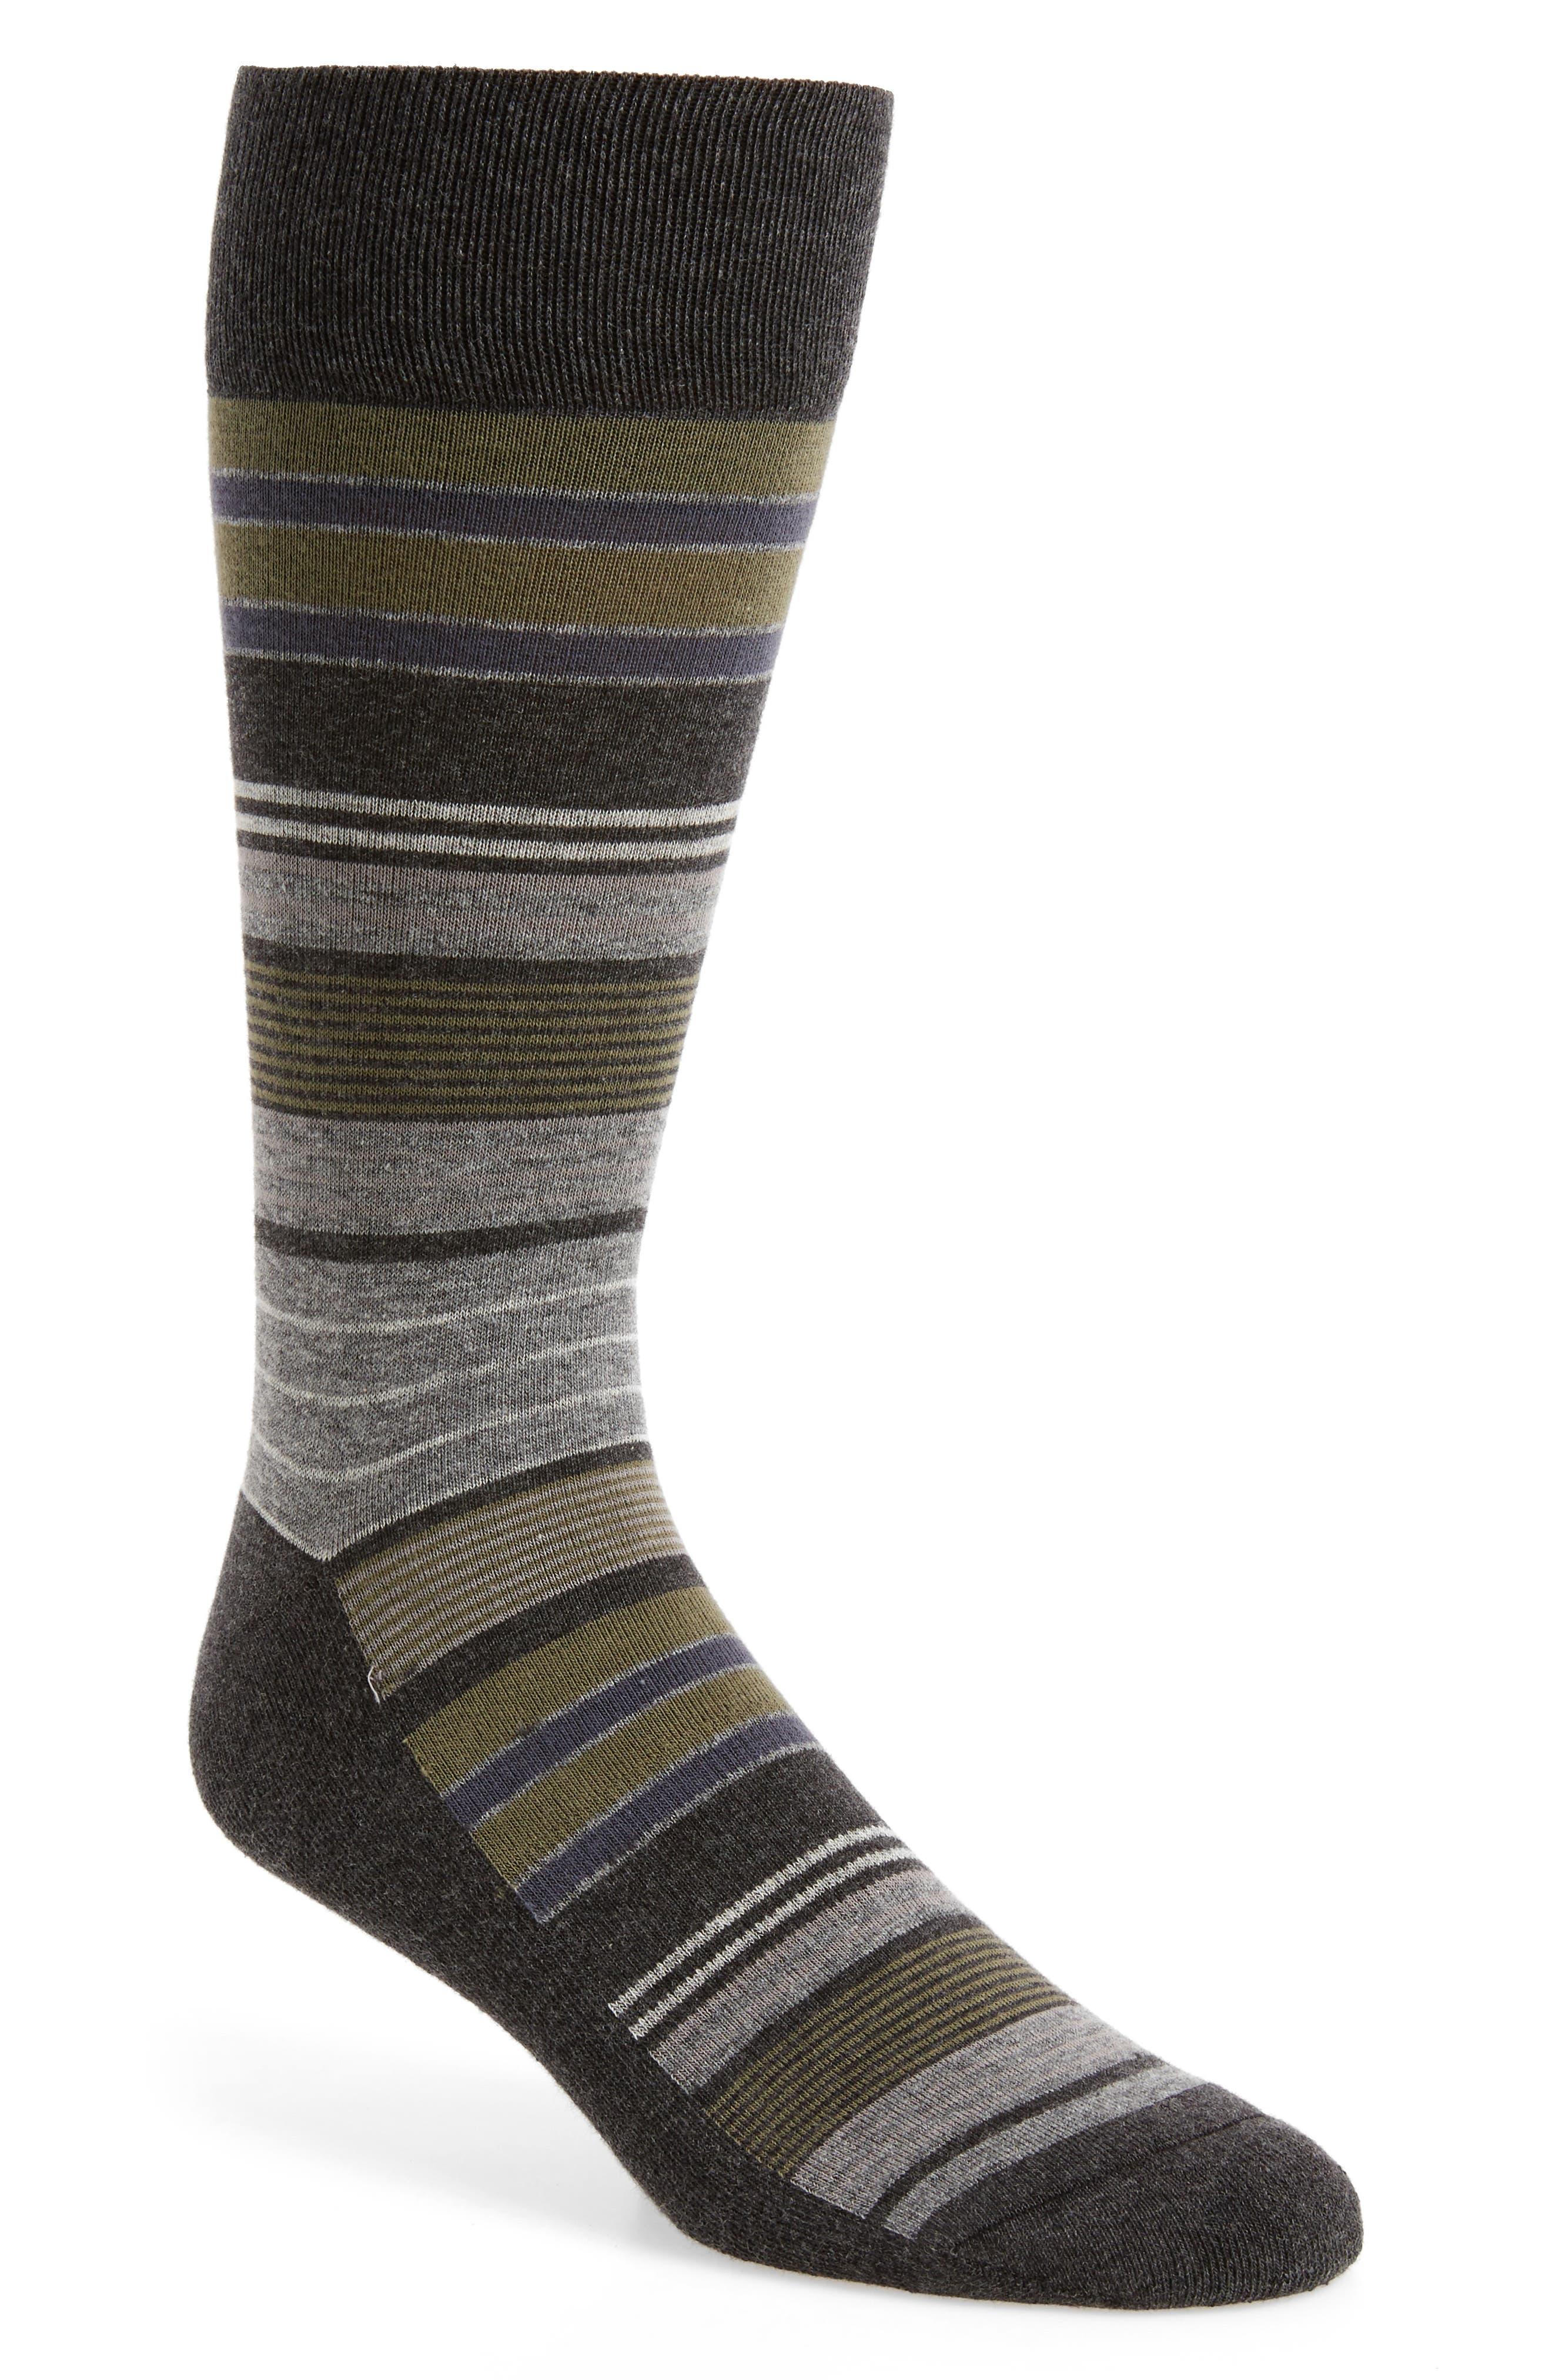 Nordstrom Men's Shop Random Stripe Socks (3 for $30)